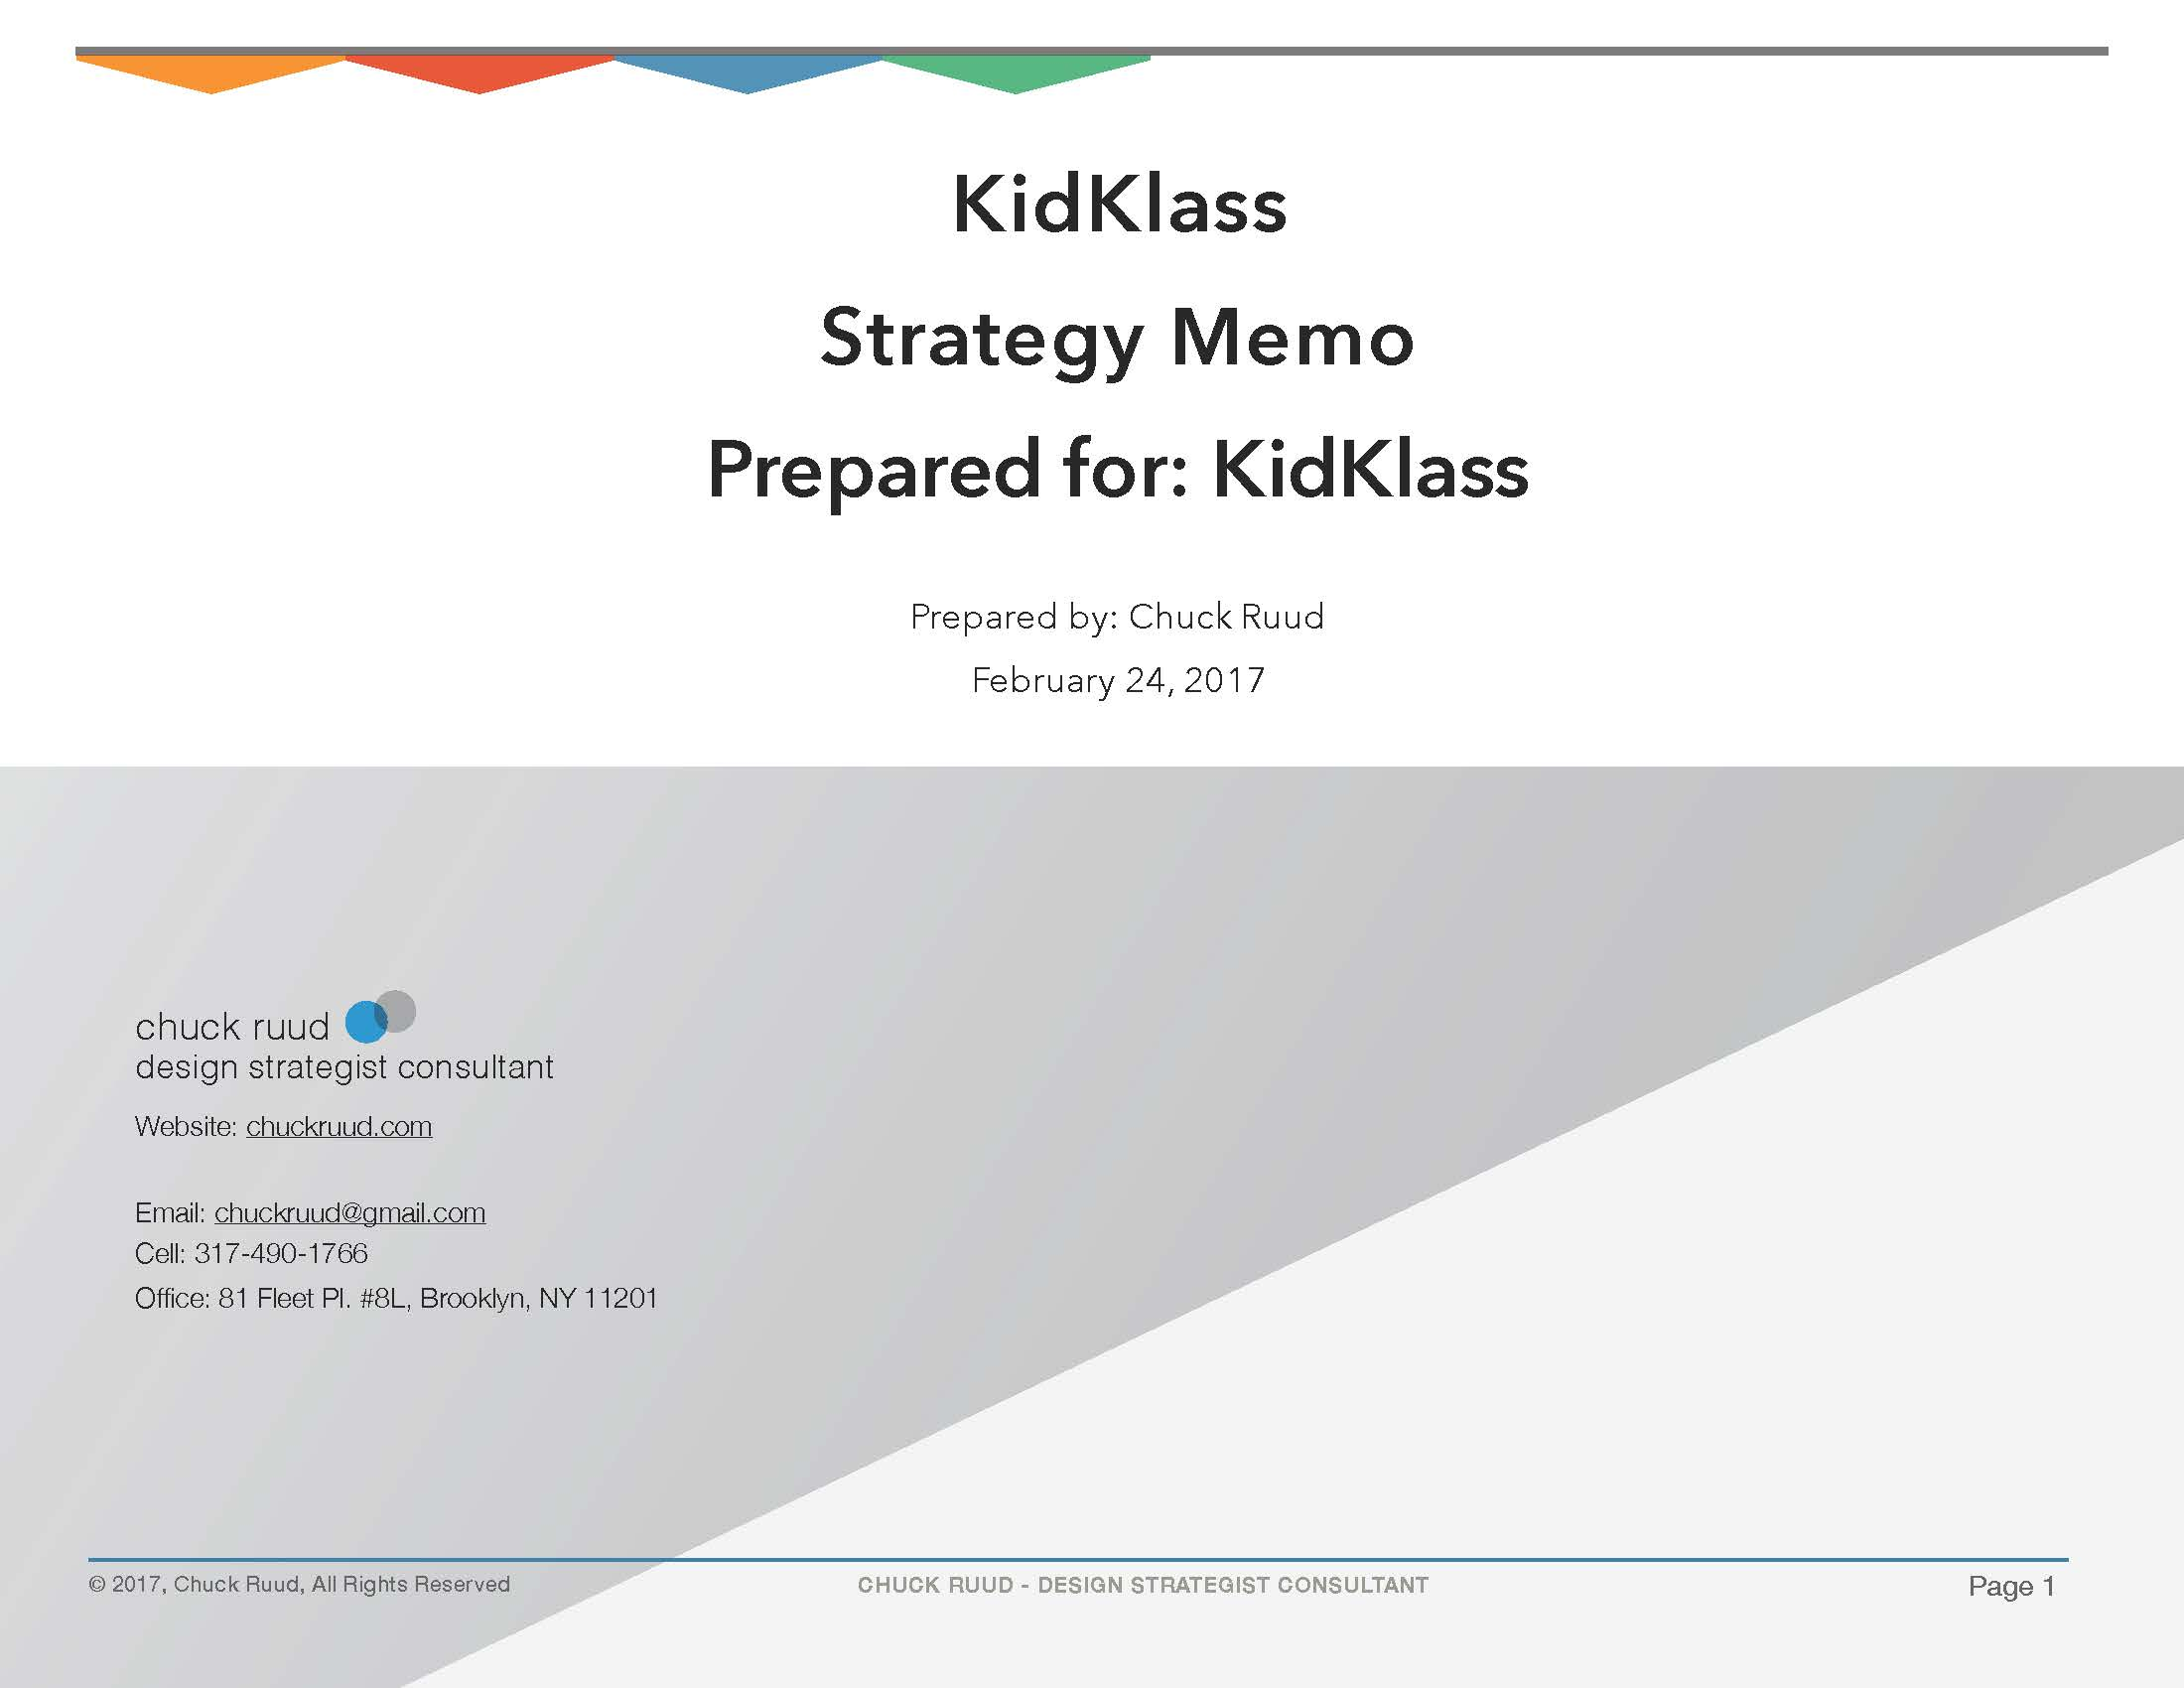 KidKlass-Analize-deck-22717_Page_01.jpg